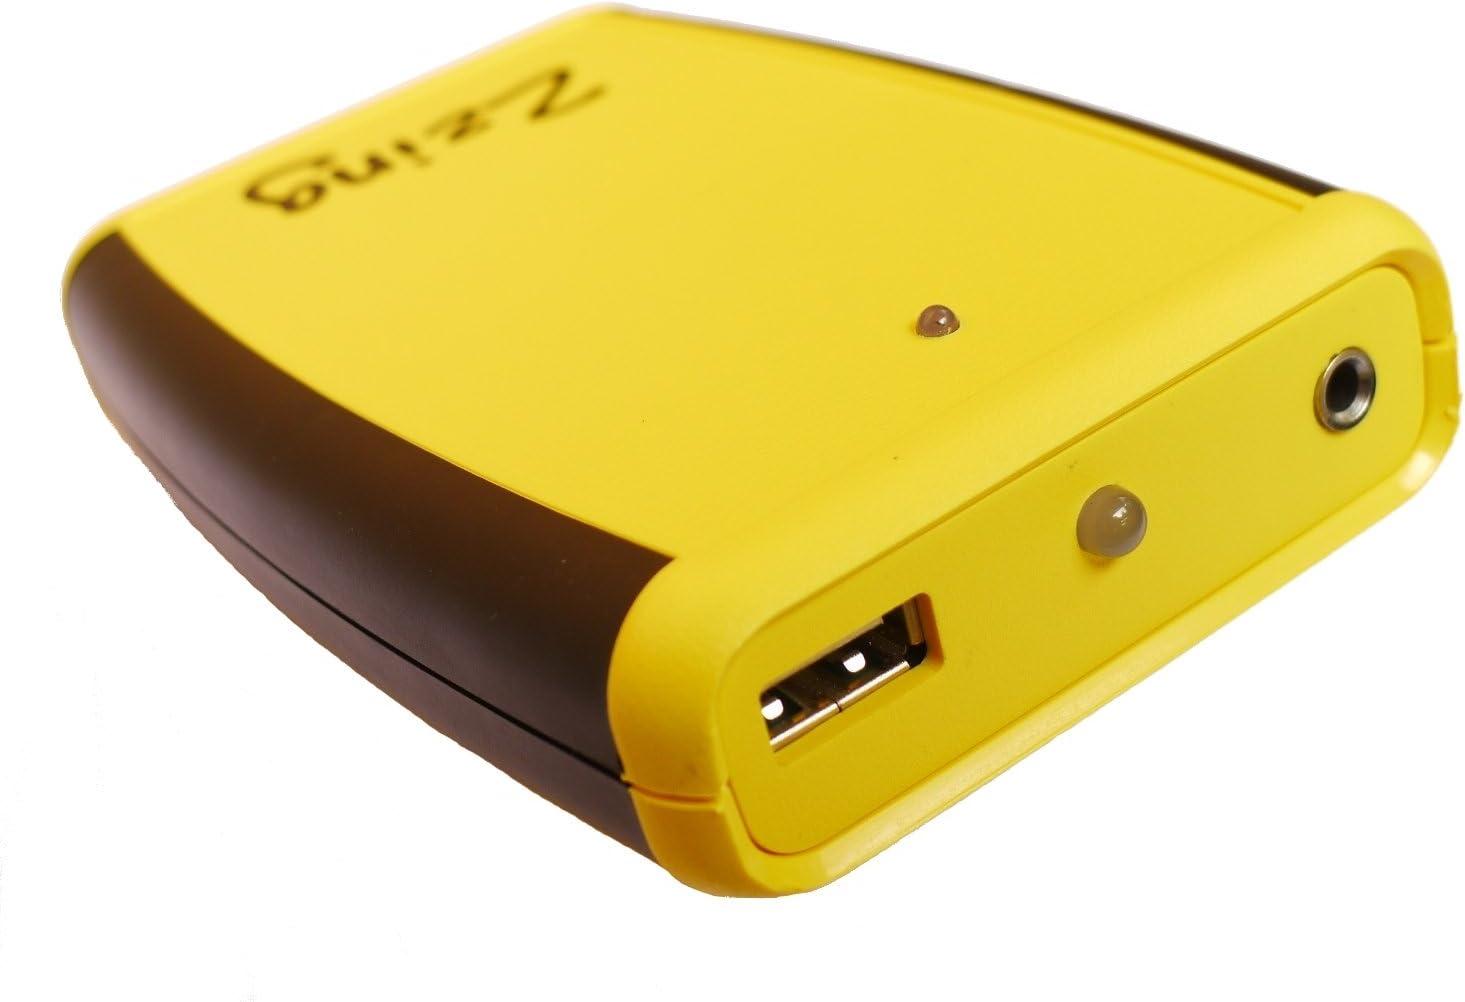 Cargador USB Zzing para bicicleta-Hub Dynamo - Smartphone Edition ...